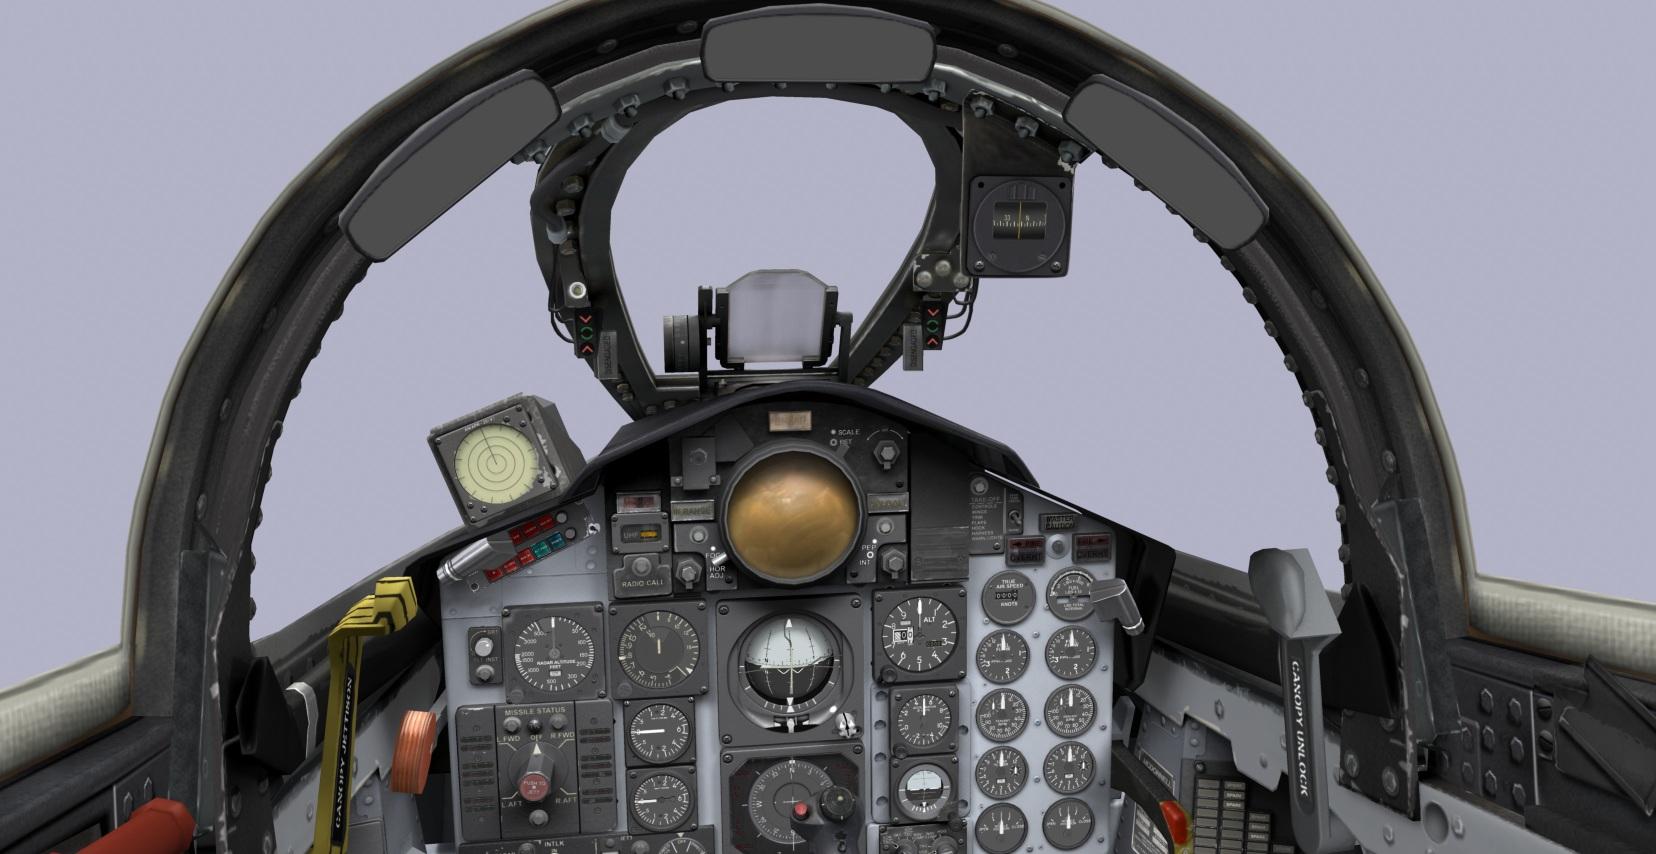 McDonnell F4C RF4C F4D and F4E Phantom II USAF